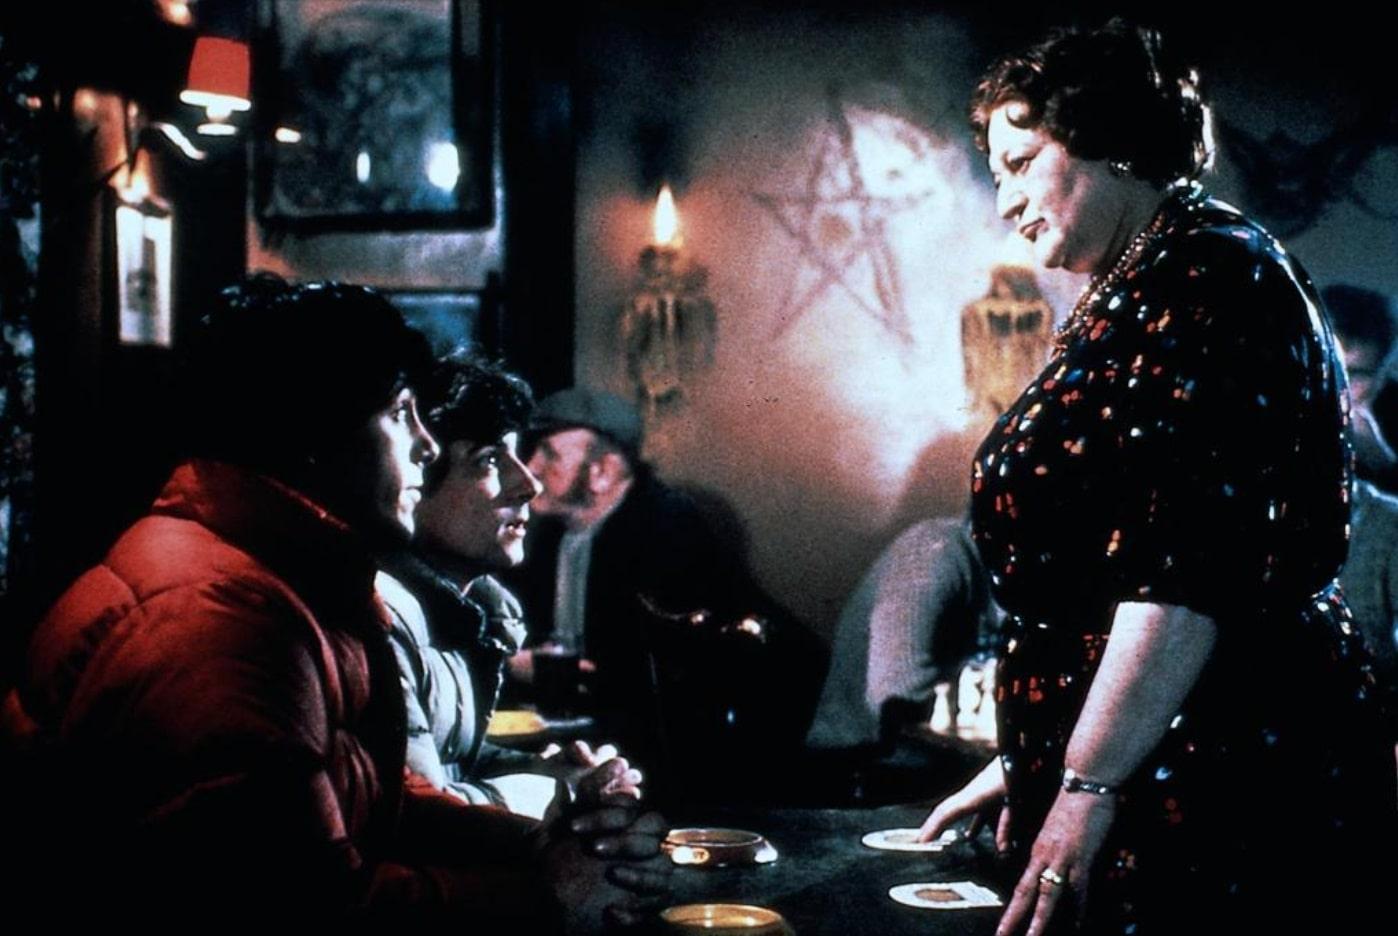 Американский оборотень в Лондоне / An American Werewolf in London (1981): кадр из фильма